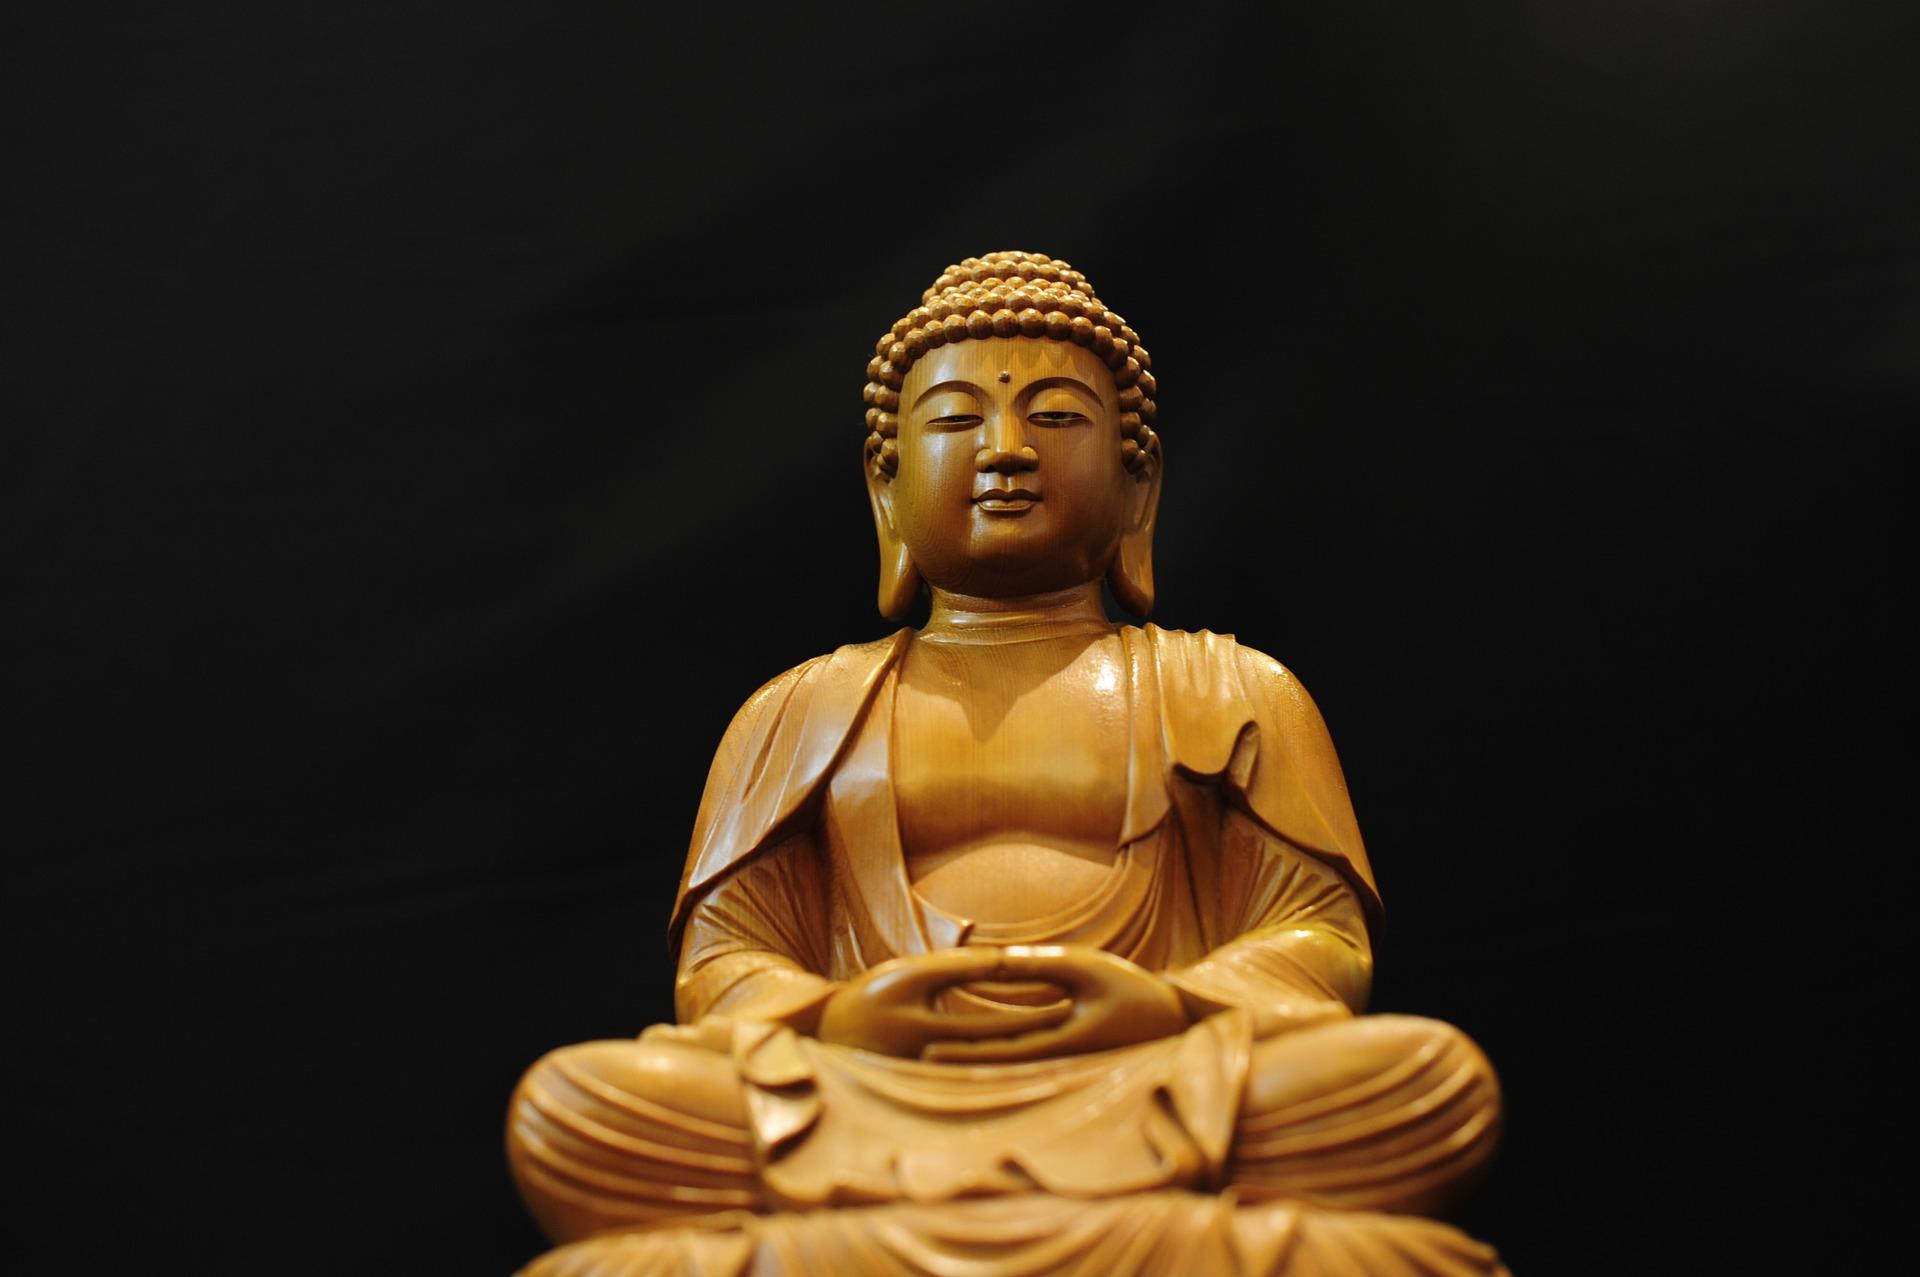 buddha 2919798 1920